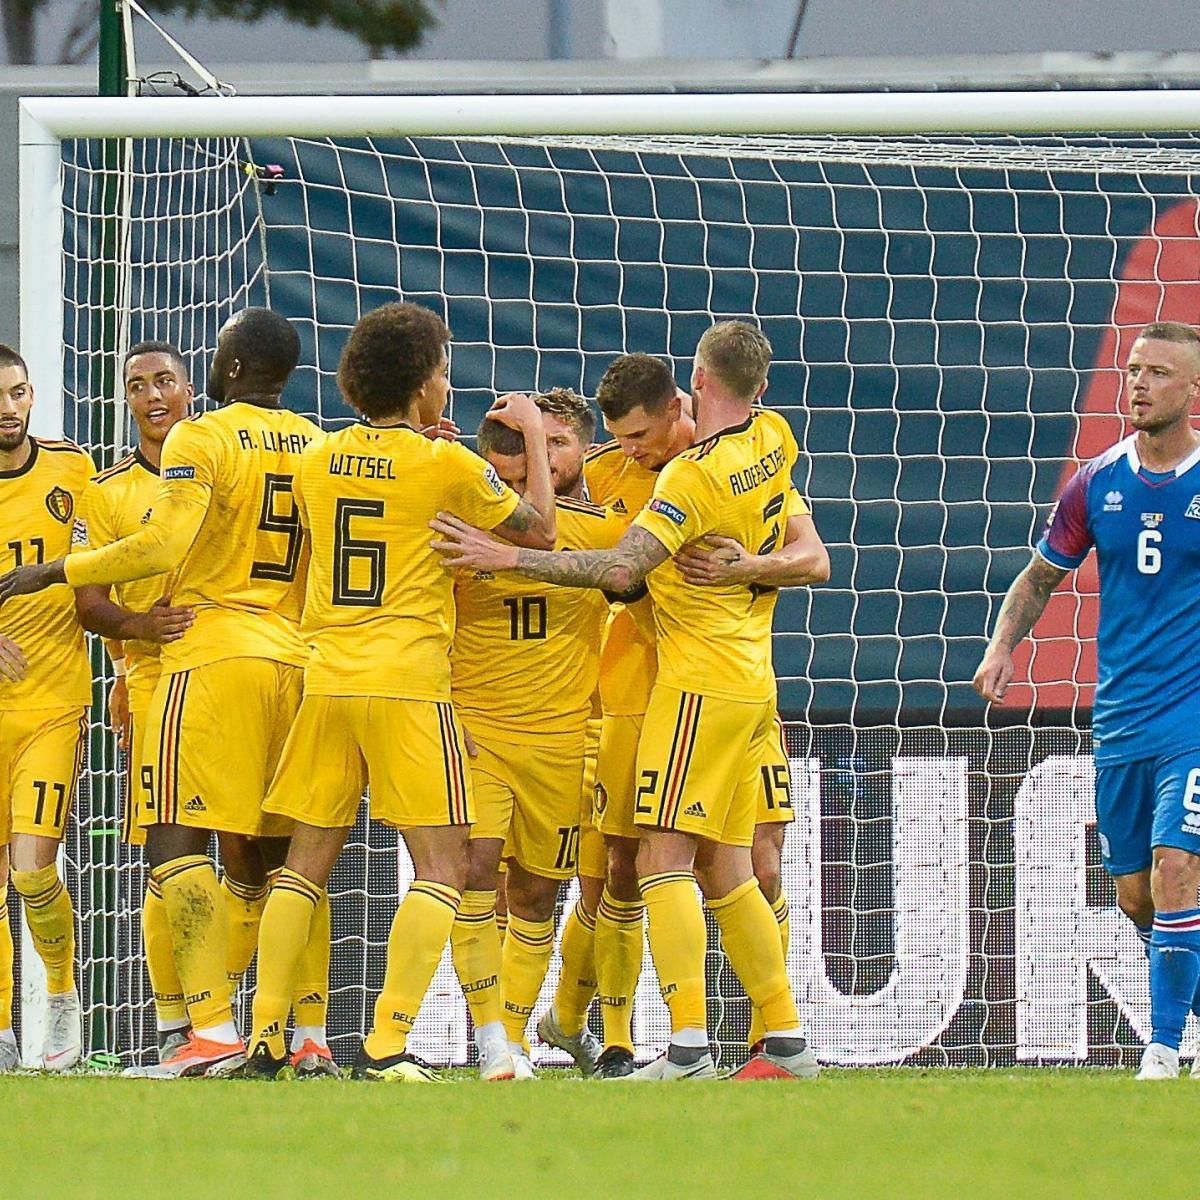 Eden Hazard, Romelu Lukaku Lead Belgium to UEFA Nations League Win vs. Iceland